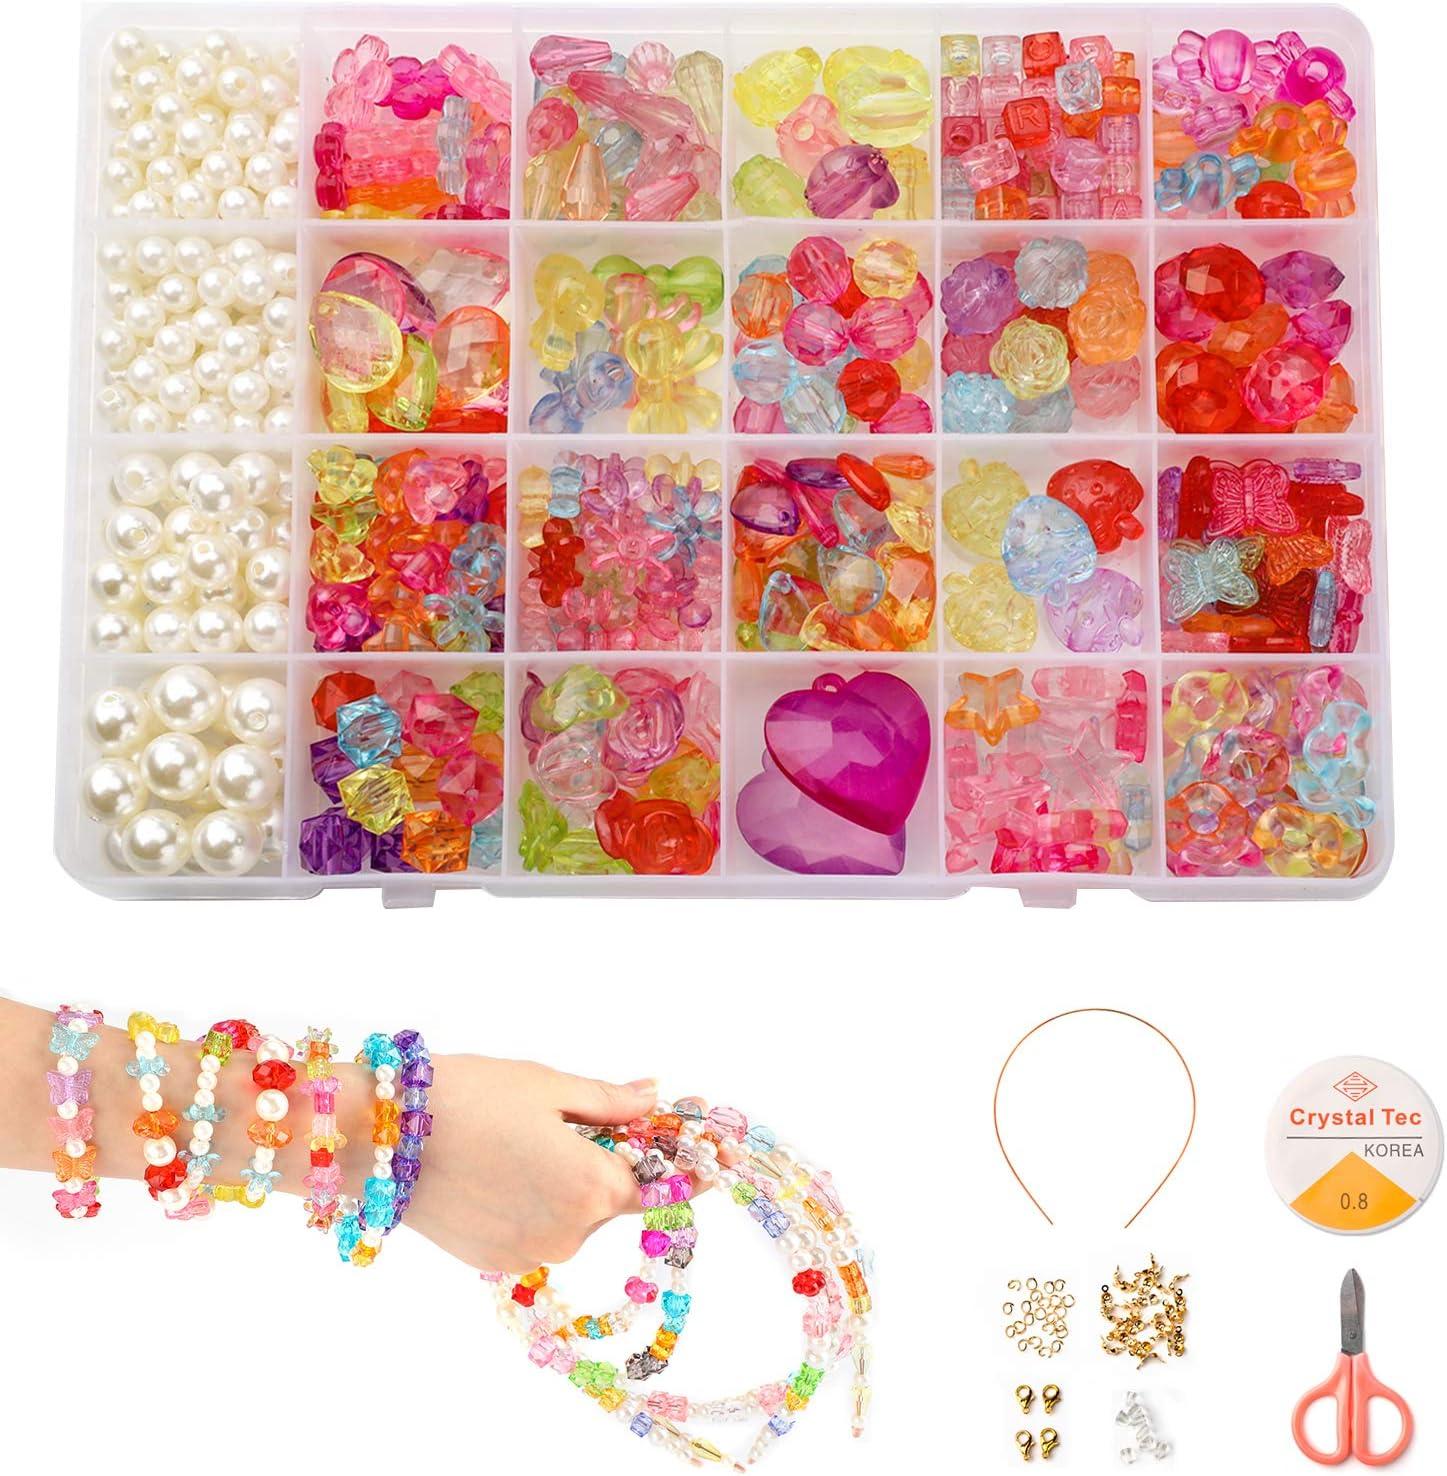 PHOGARY Set de Abalorios Infantiles DIY (500 Piezas), Pulseras de Bricolaje Collares de Cuentas para niños, Kit de joyería como Kit de Regalo para niña